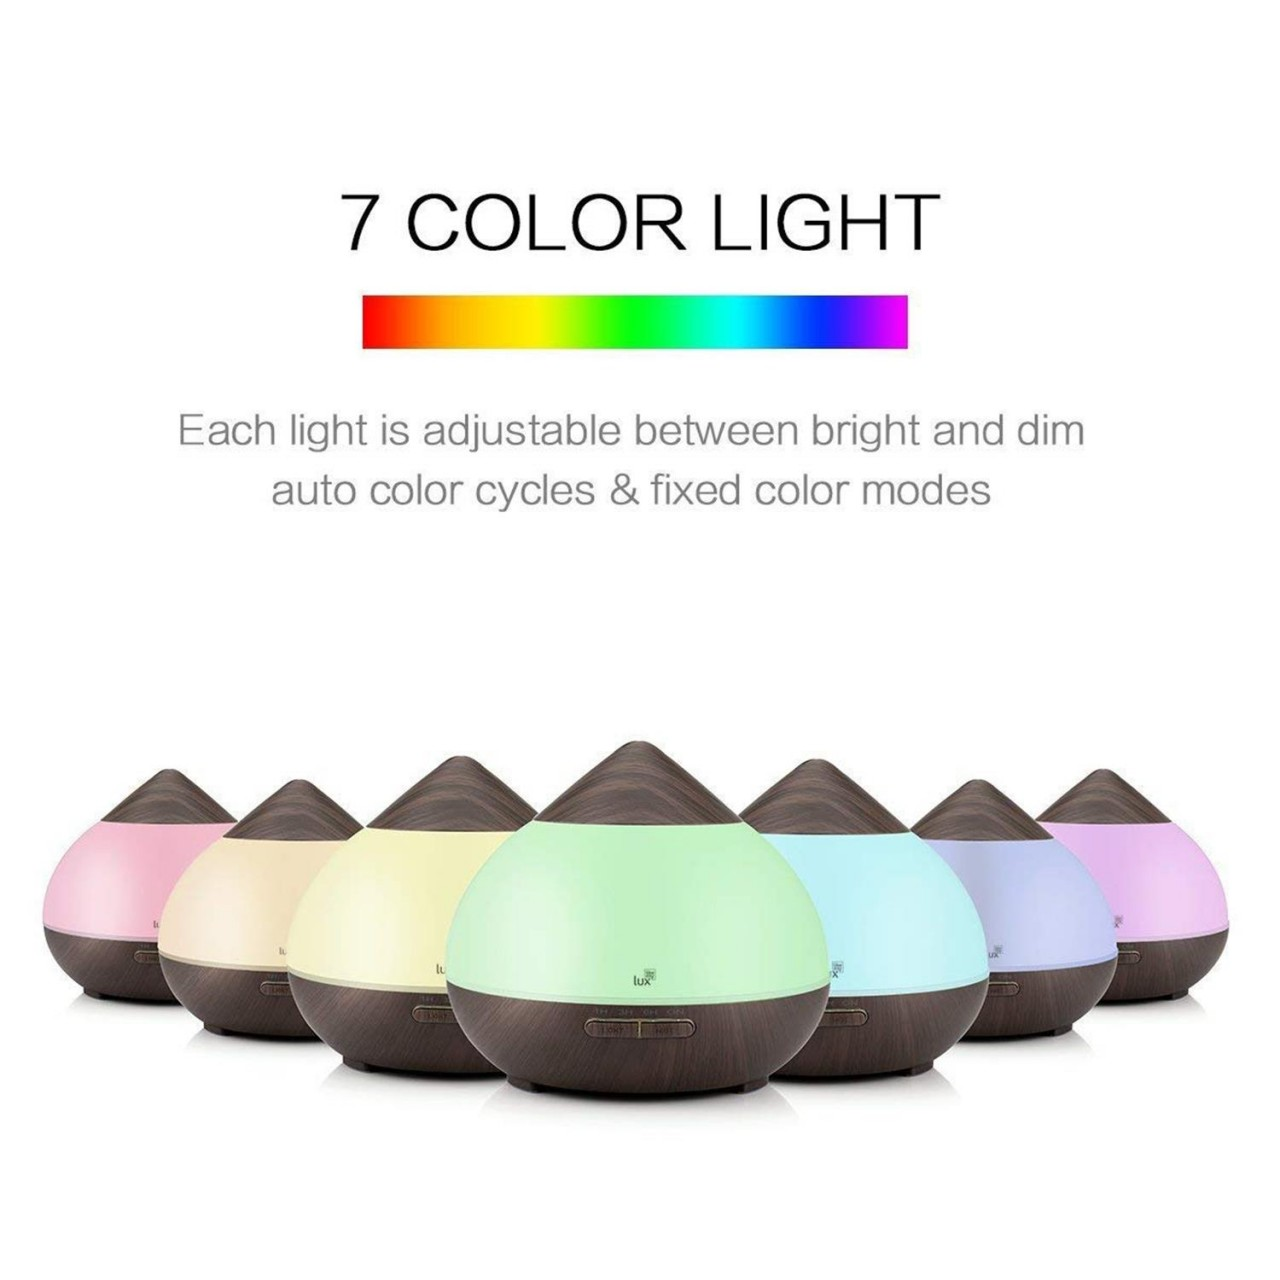 Aroma Diffuser Likemylux 300ml Luftbefeuchter Ultraschall Öl Diffusor LED